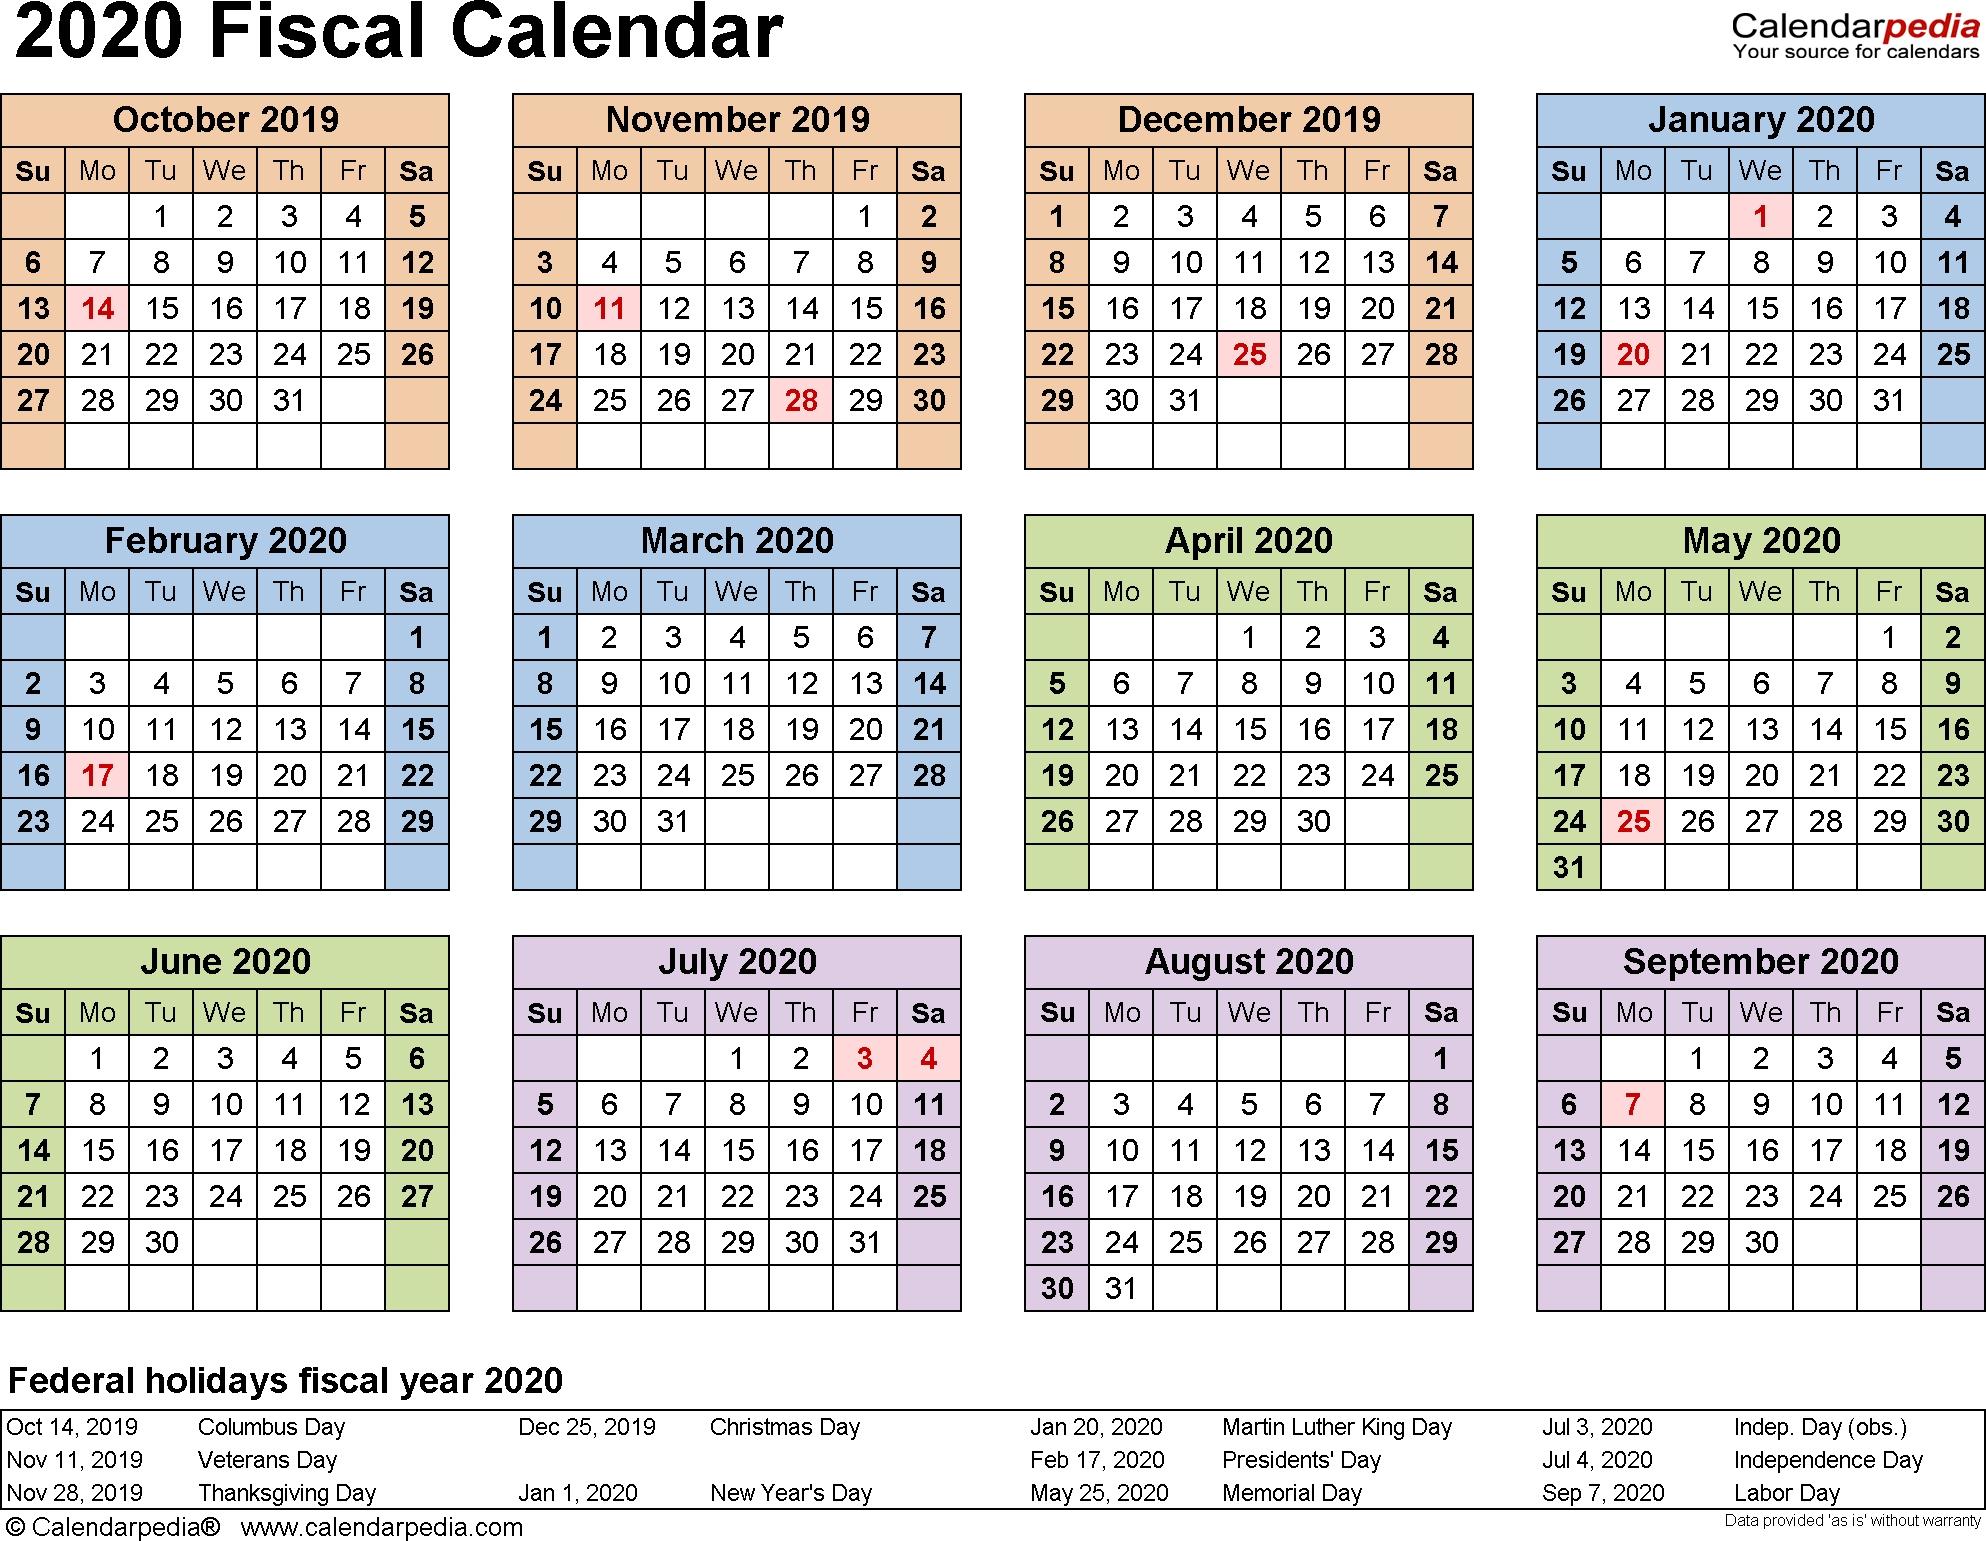 Fiscal Calendars 2020 As Free Printable Word Templates-Blank Quarterly Calendar Printable 2020